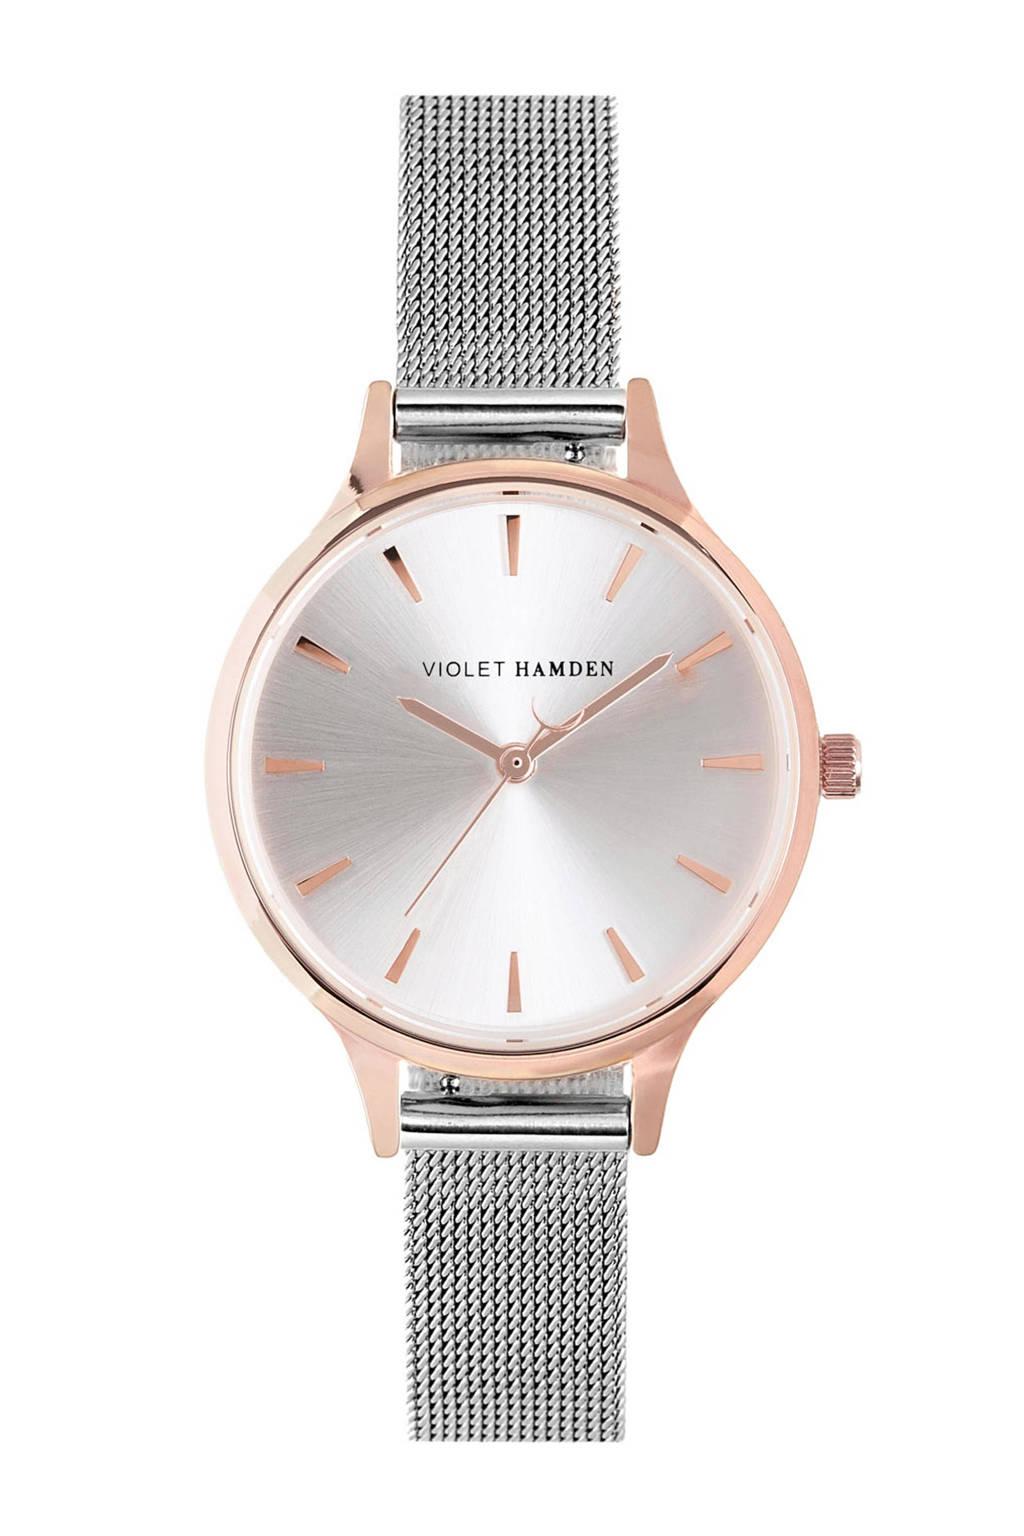 Violet Hamden Nowness horloge - VH01009, Rosé